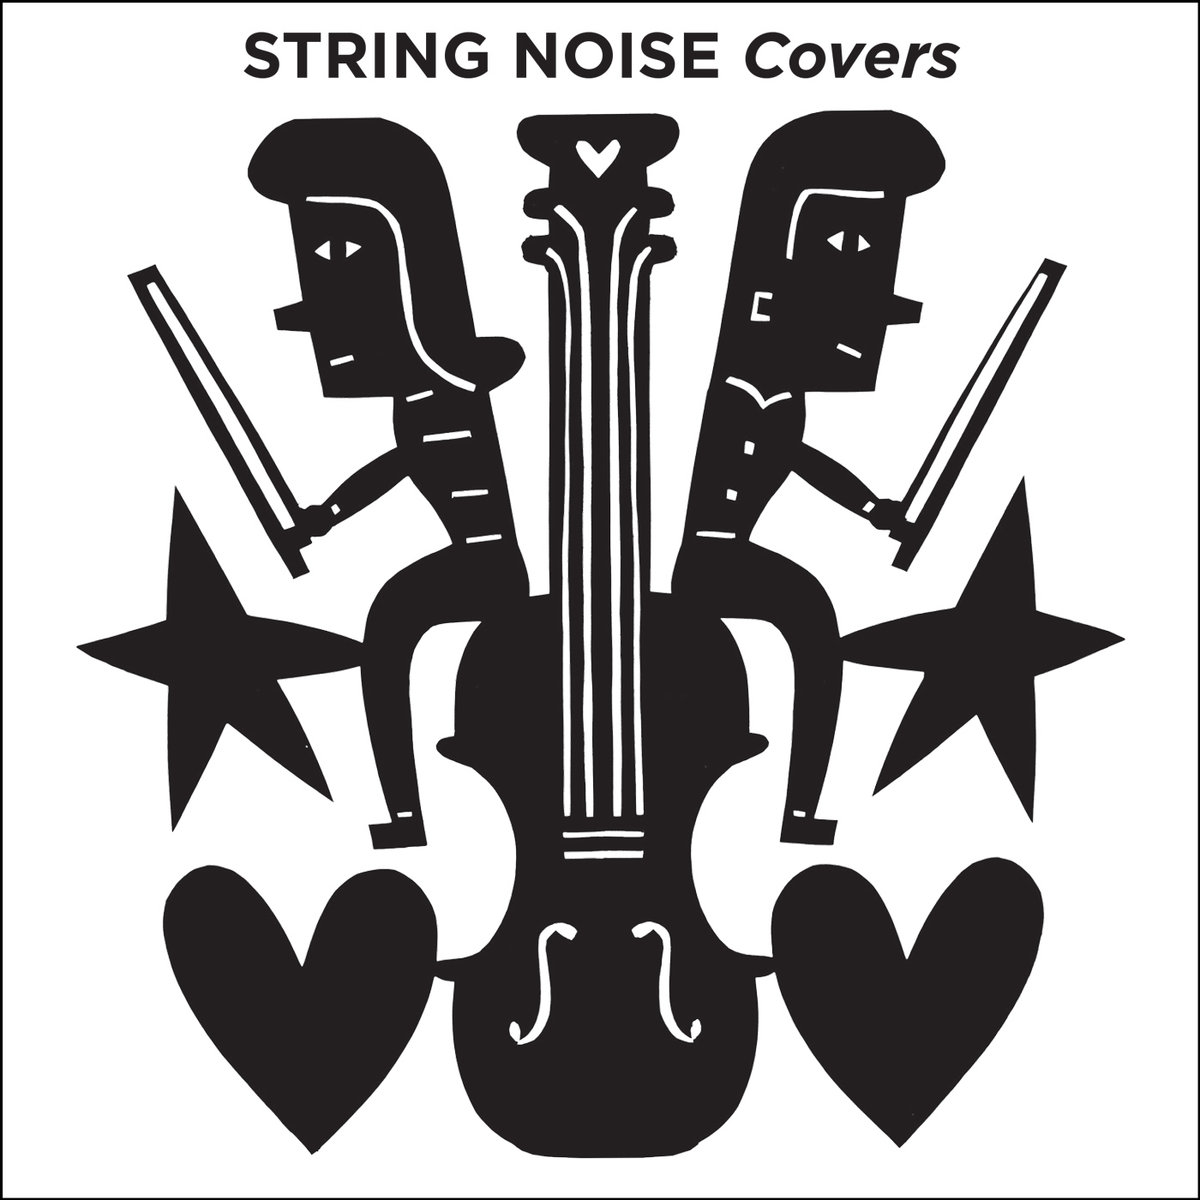 Noise clipart music Noise Music  String